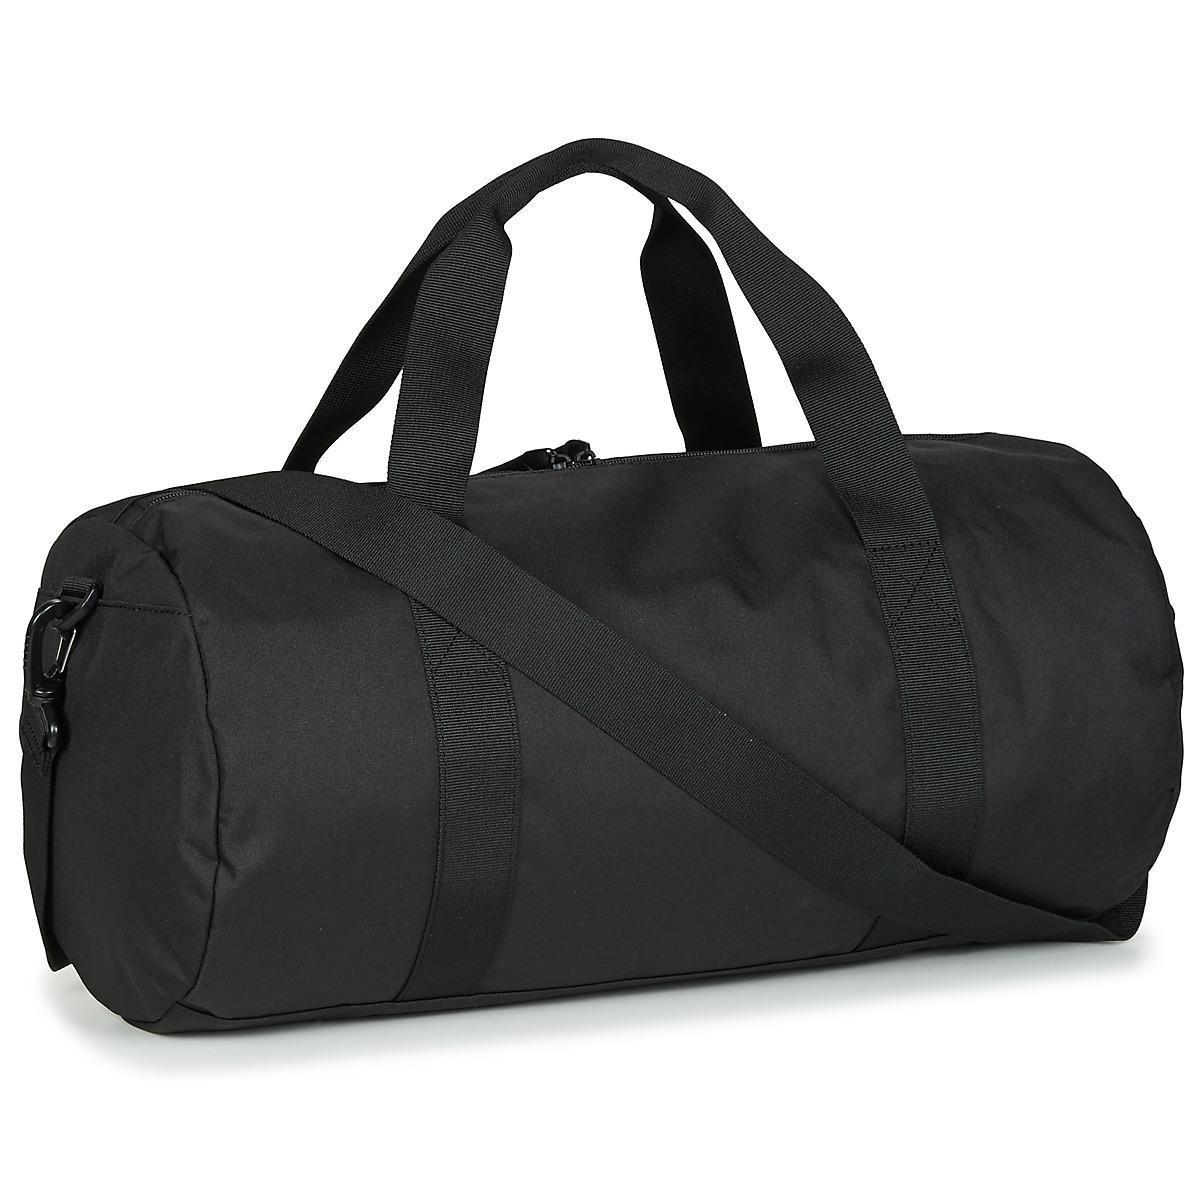 8ae9fd6c Lacoste Neocroc Women's Sports Bag In Black for men